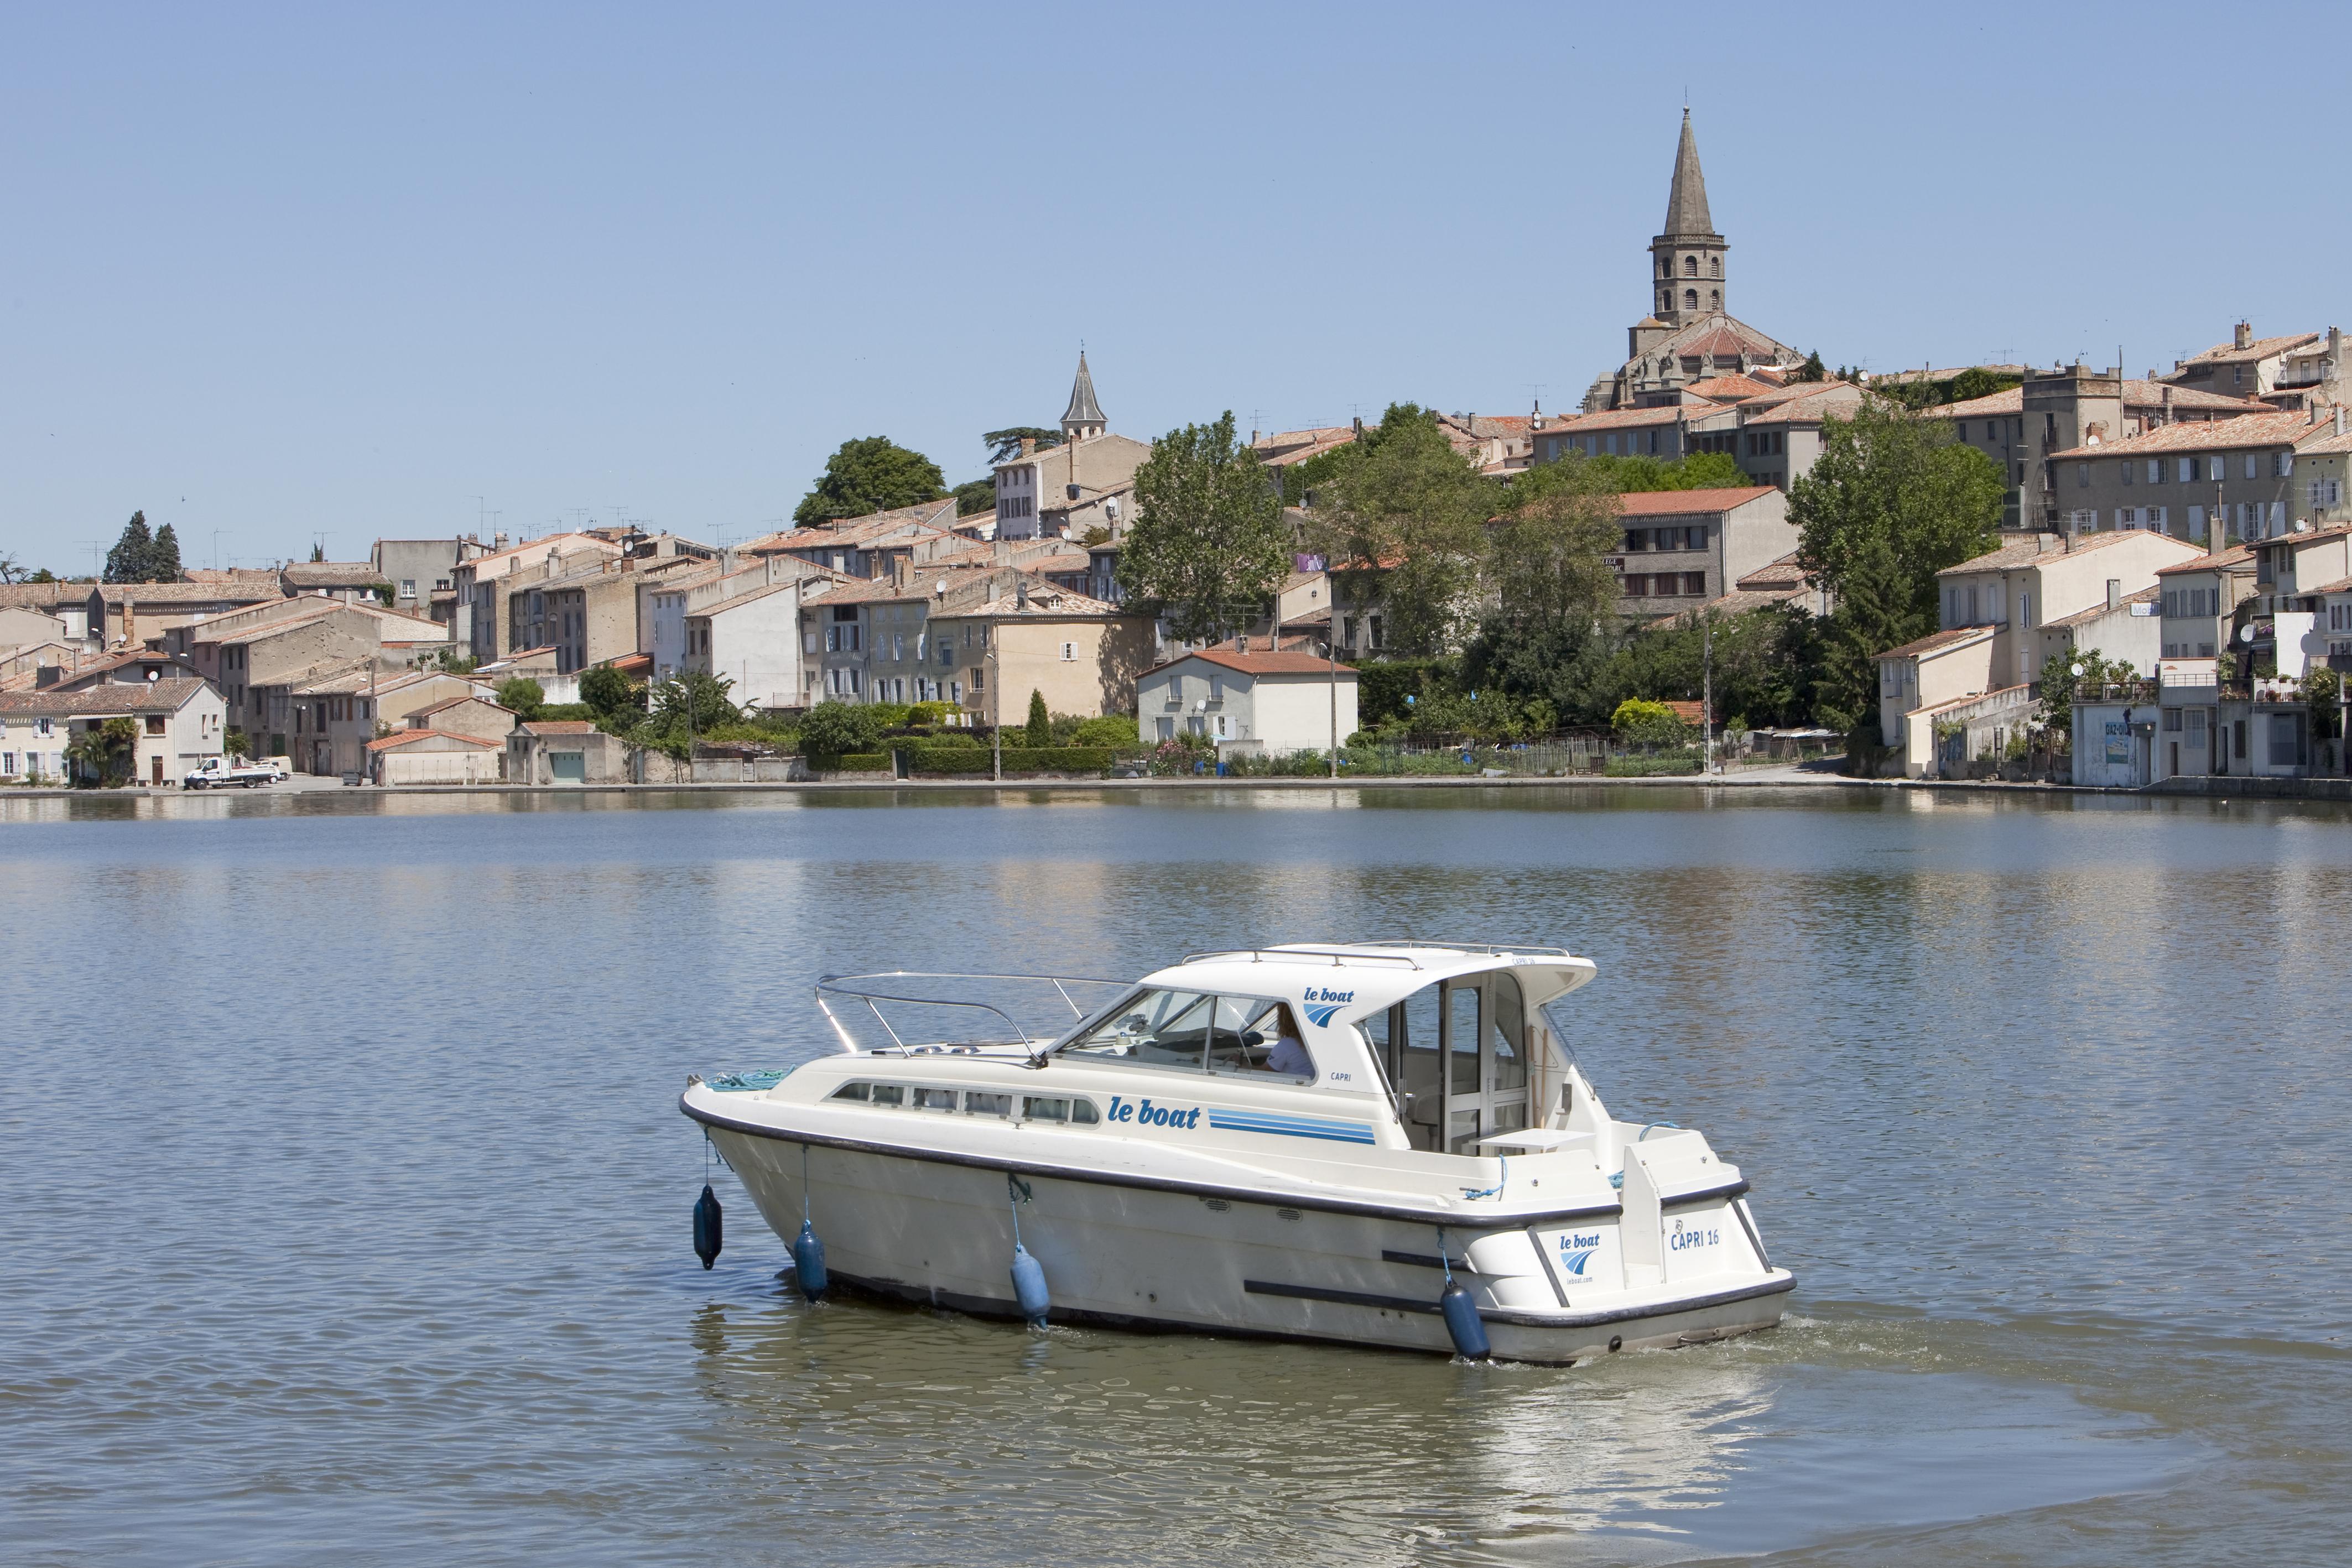 Castelnaudary (Le Boat)